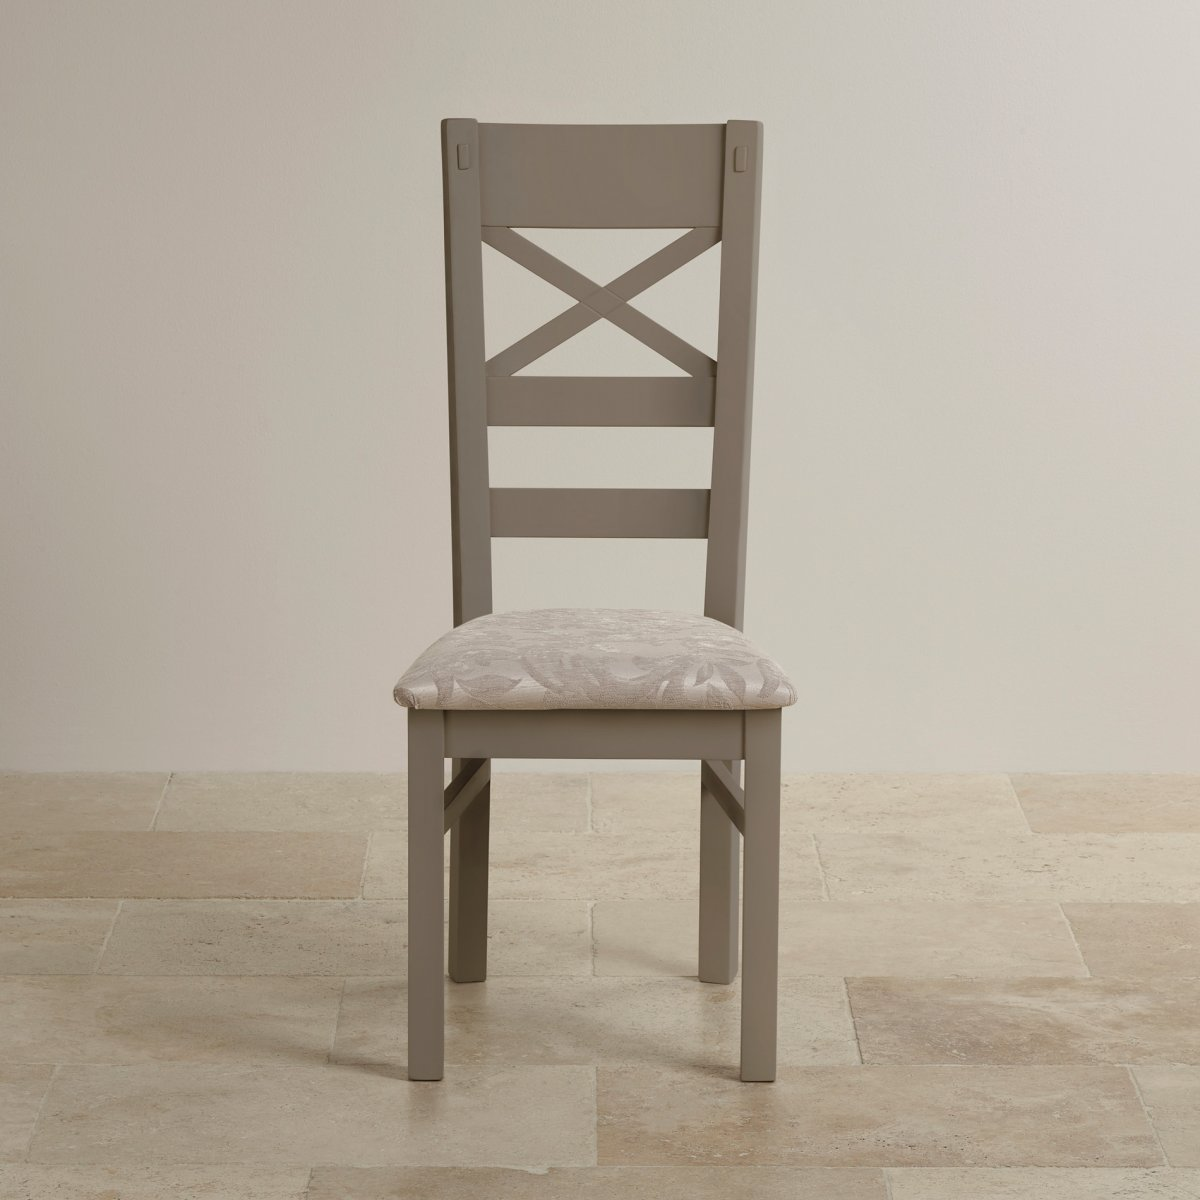 st ives light grey painted oak and plain sage dining chair. Black Bedroom Furniture Sets. Home Design Ideas